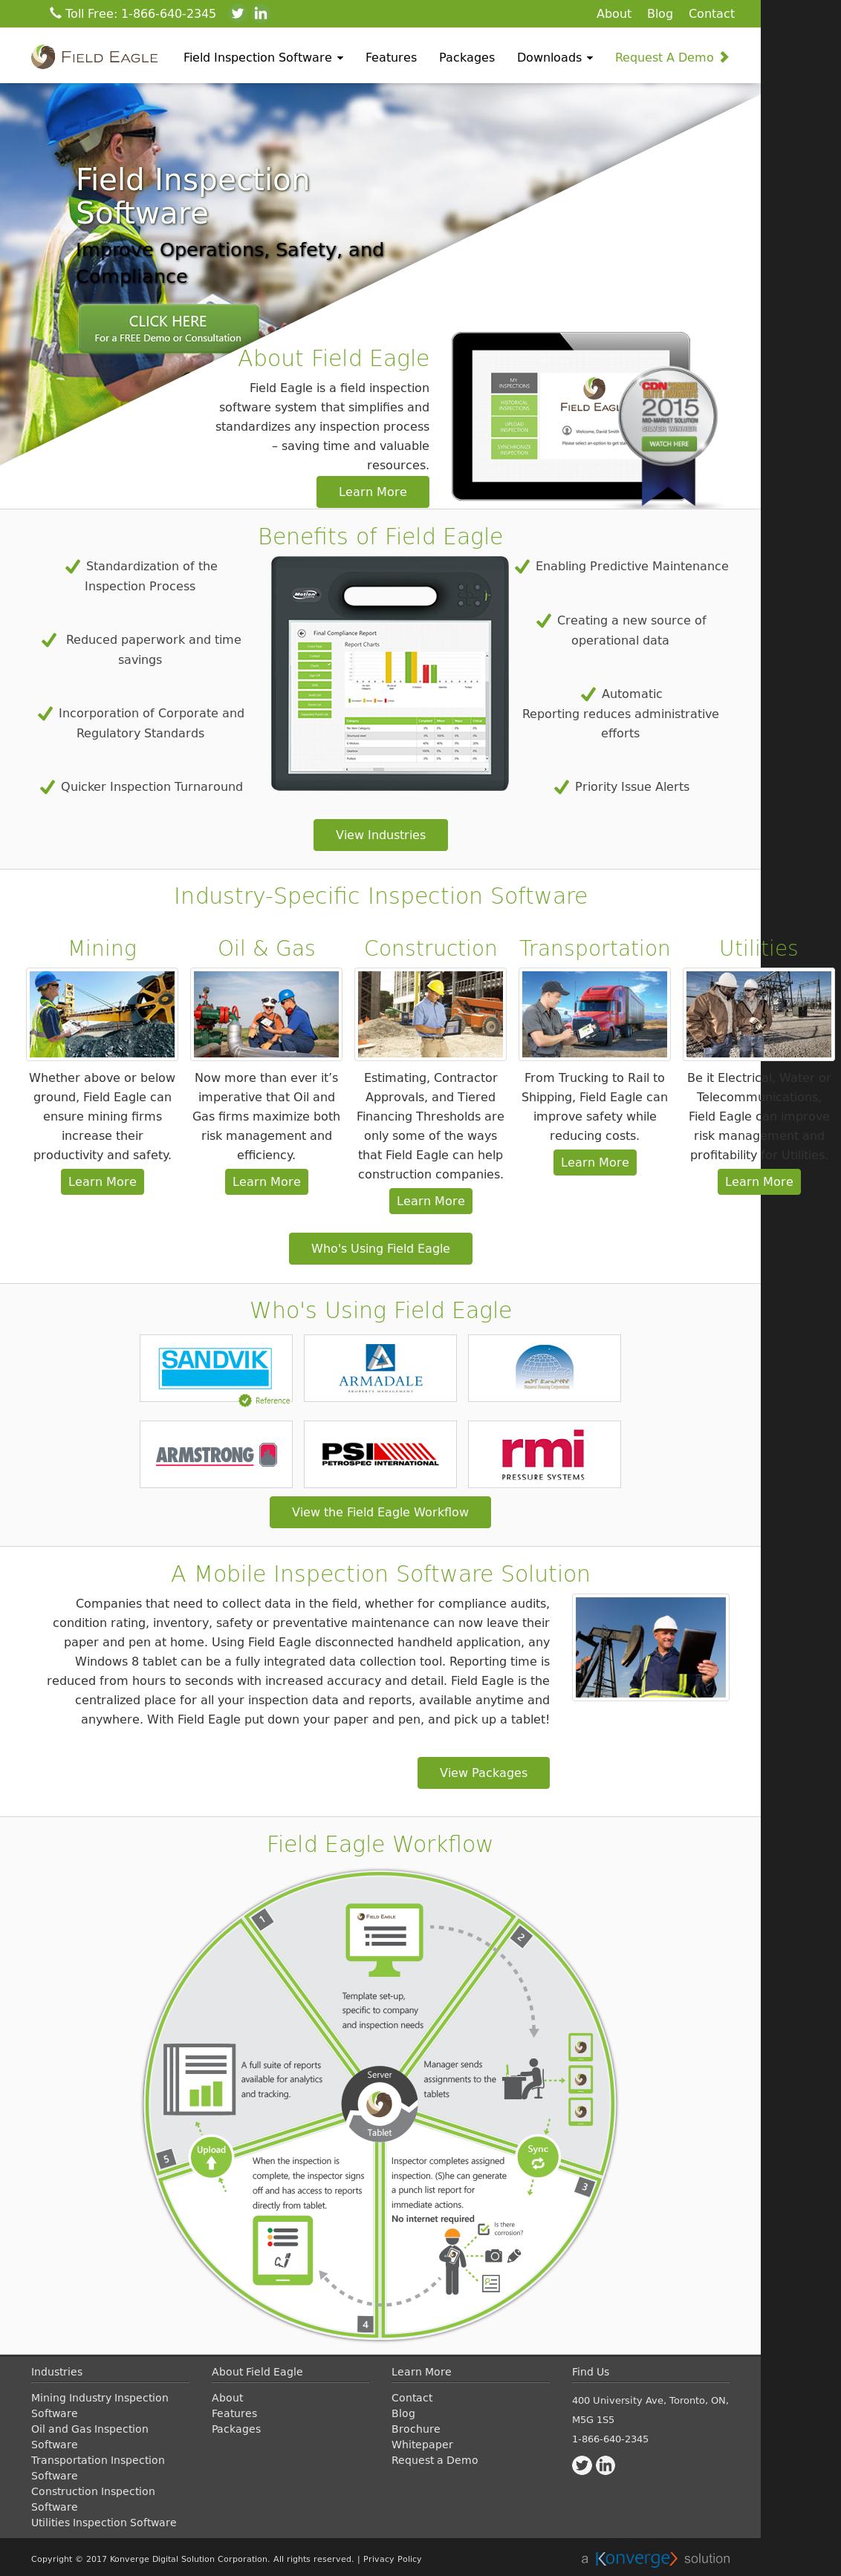 Field Eagle Competitors, Revenue and Employees - Owler Company Profile